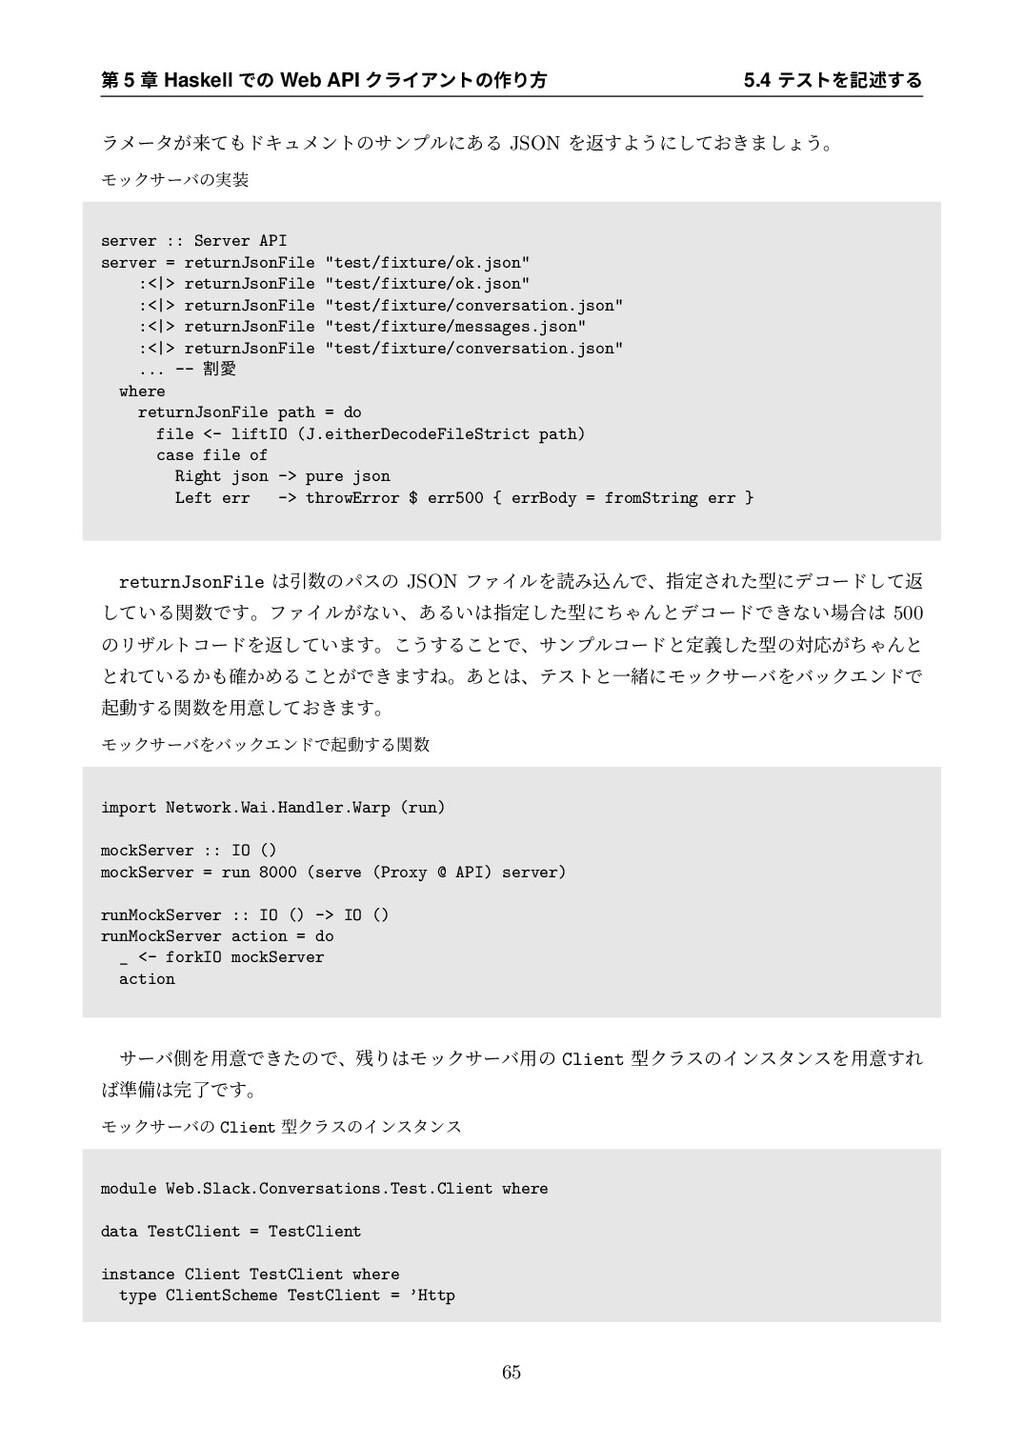 ୈ 5 ষ Haskell Ͱͷ Web API ΫϥΠΞϯτͷ࡞Γํ 5.4 ςετΛهड़͢...